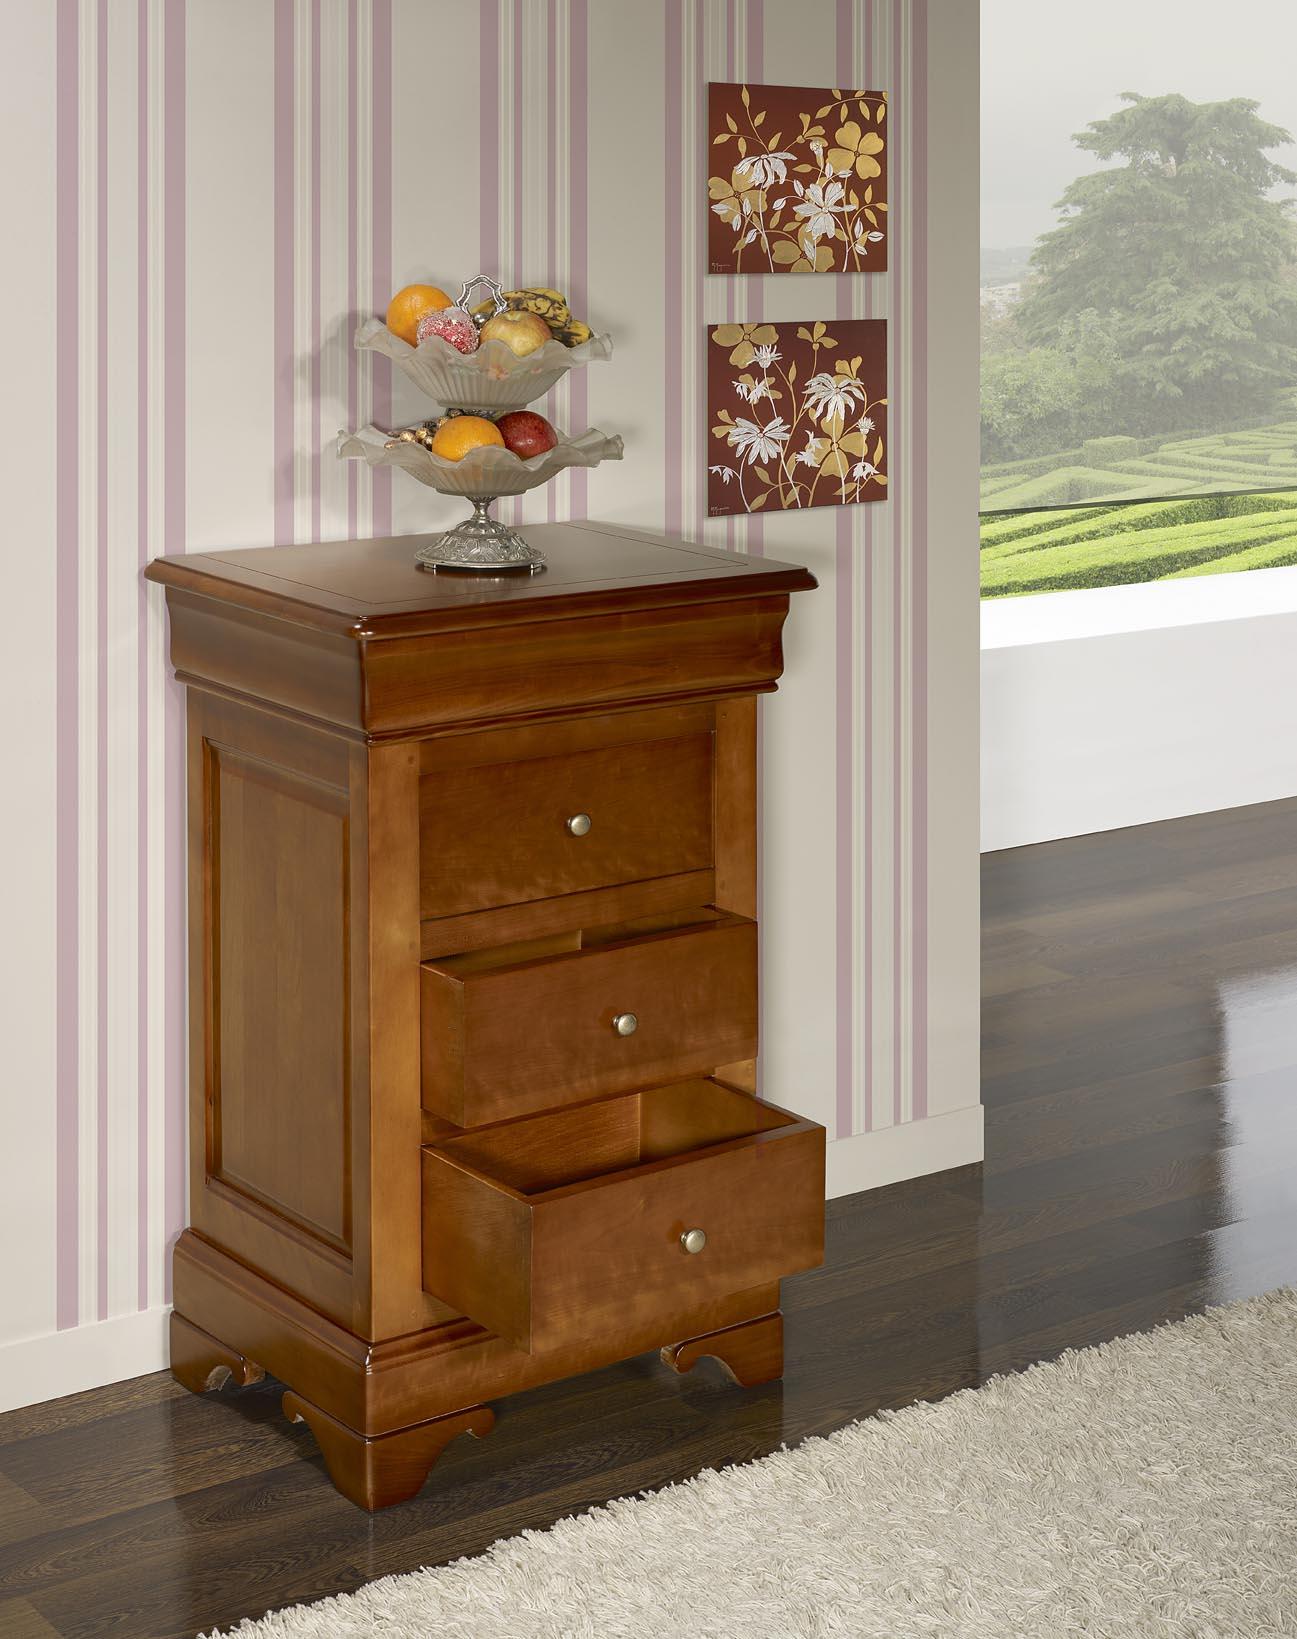 chiffonnier 4 tiroirs en merisier massif de style louis. Black Bedroom Furniture Sets. Home Design Ideas